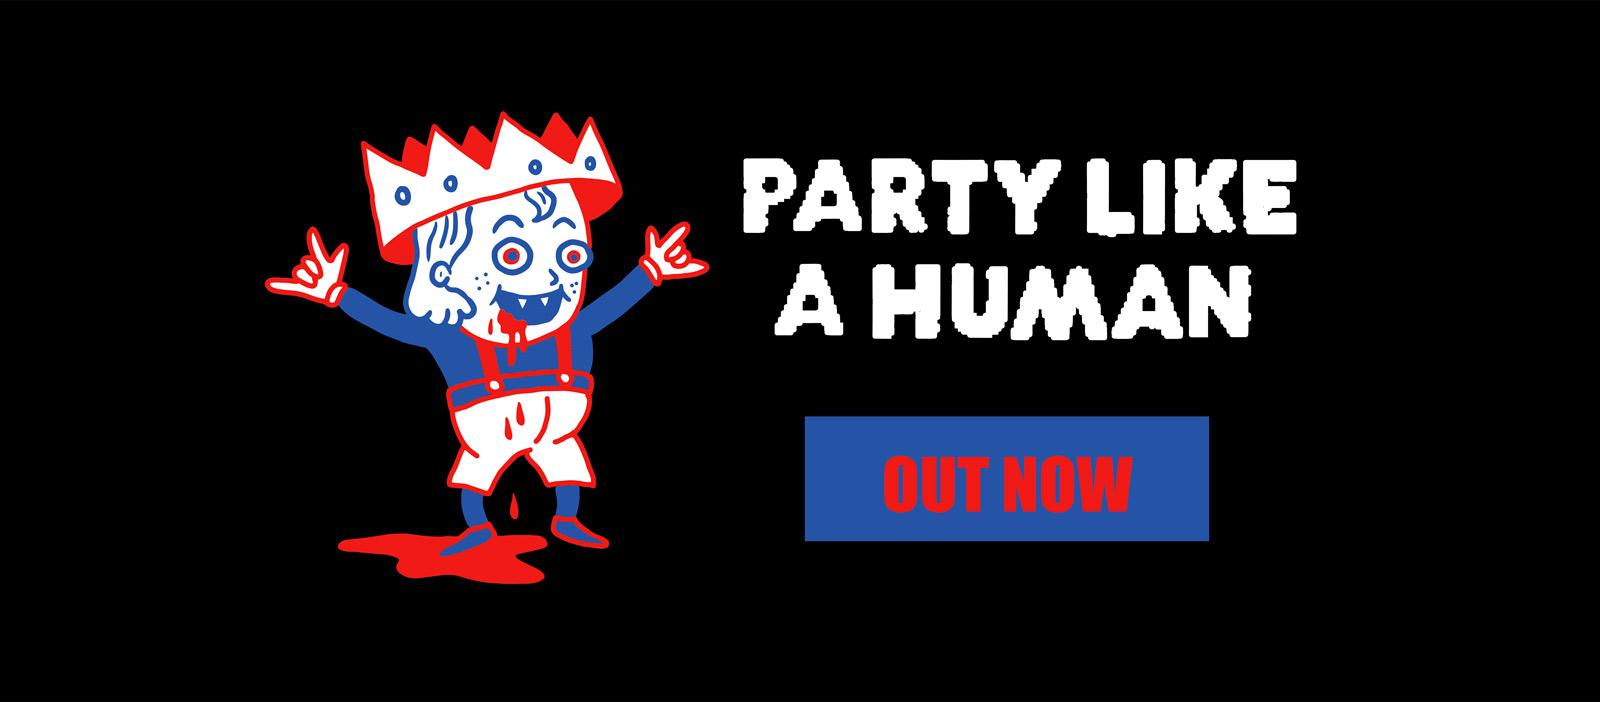 Party like a human